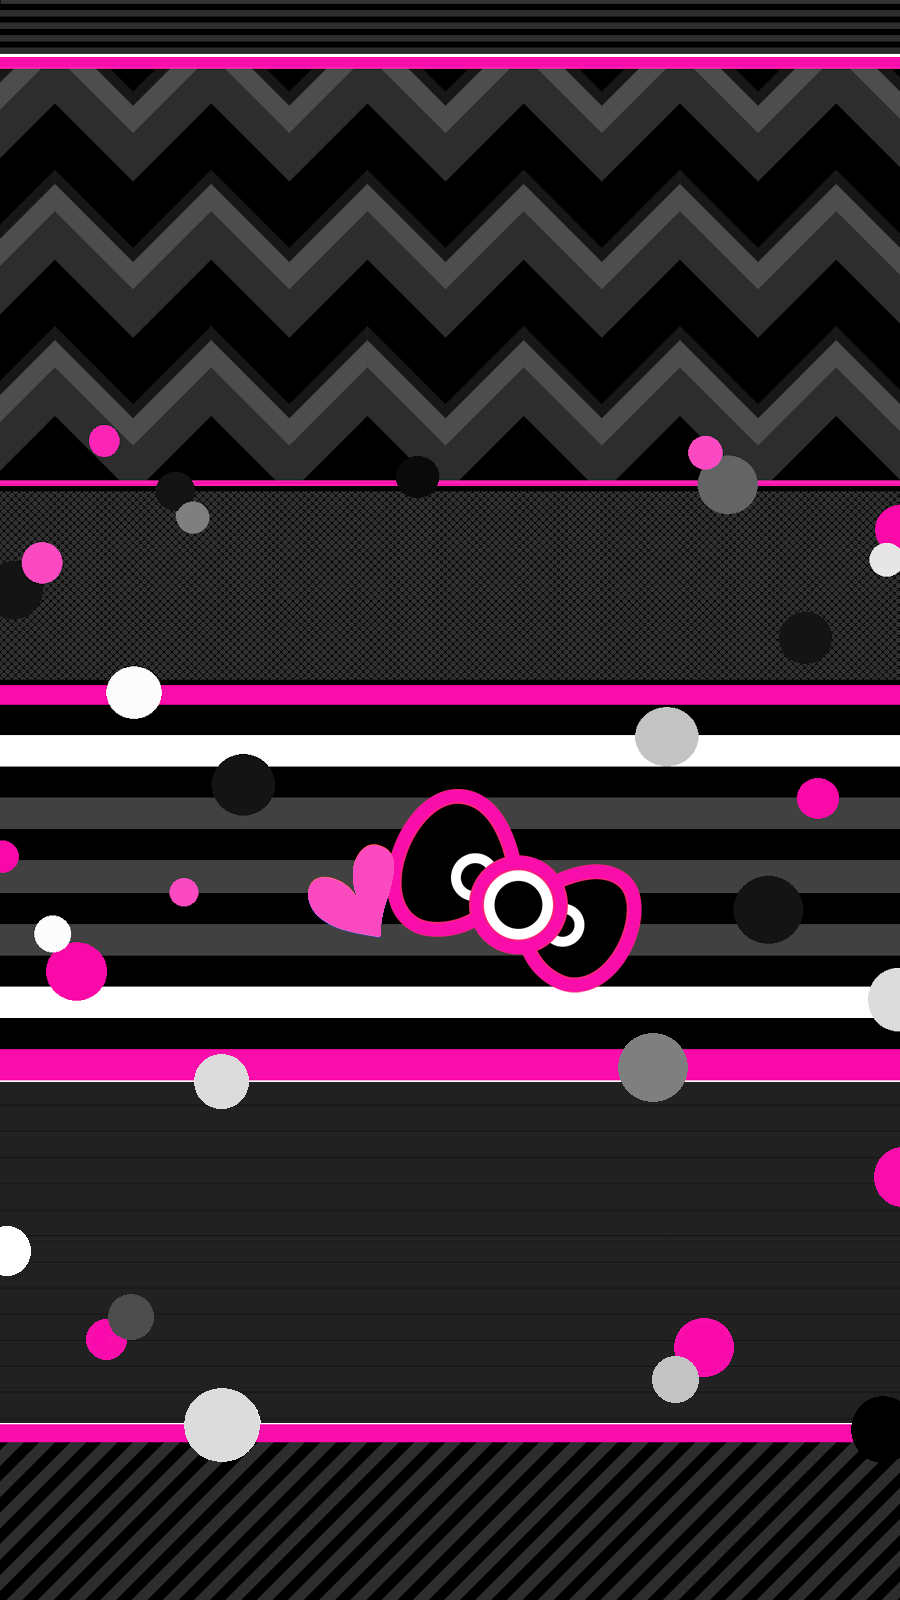 Luvnote5 Hello Kitty Iphone Wallpaper Kitty Wallpaper Iphone